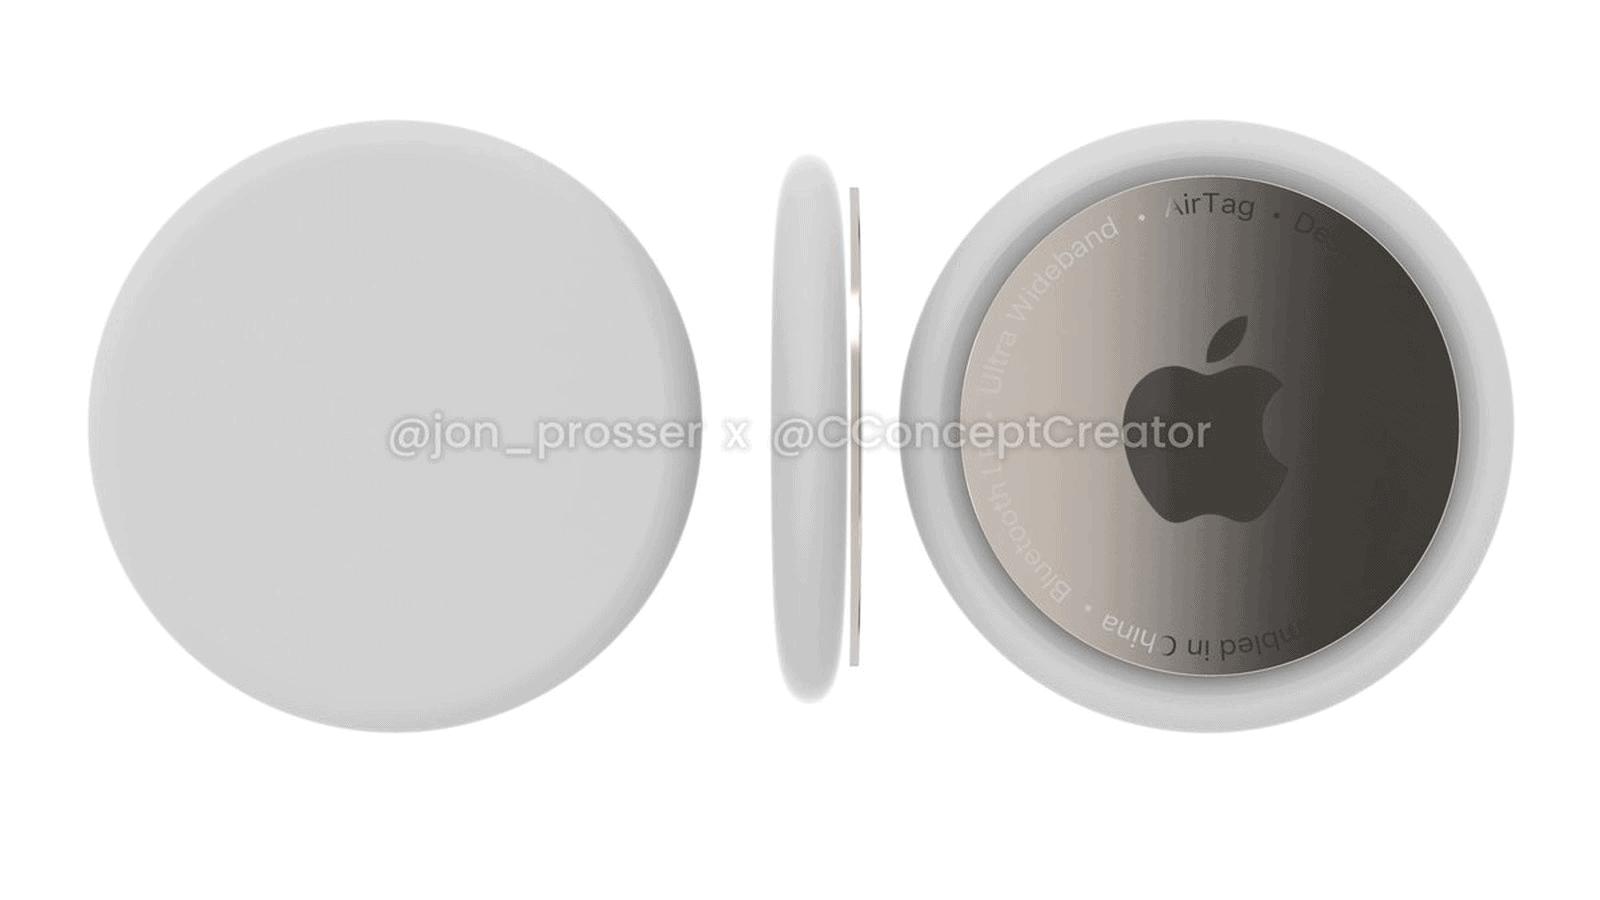 apple air tags